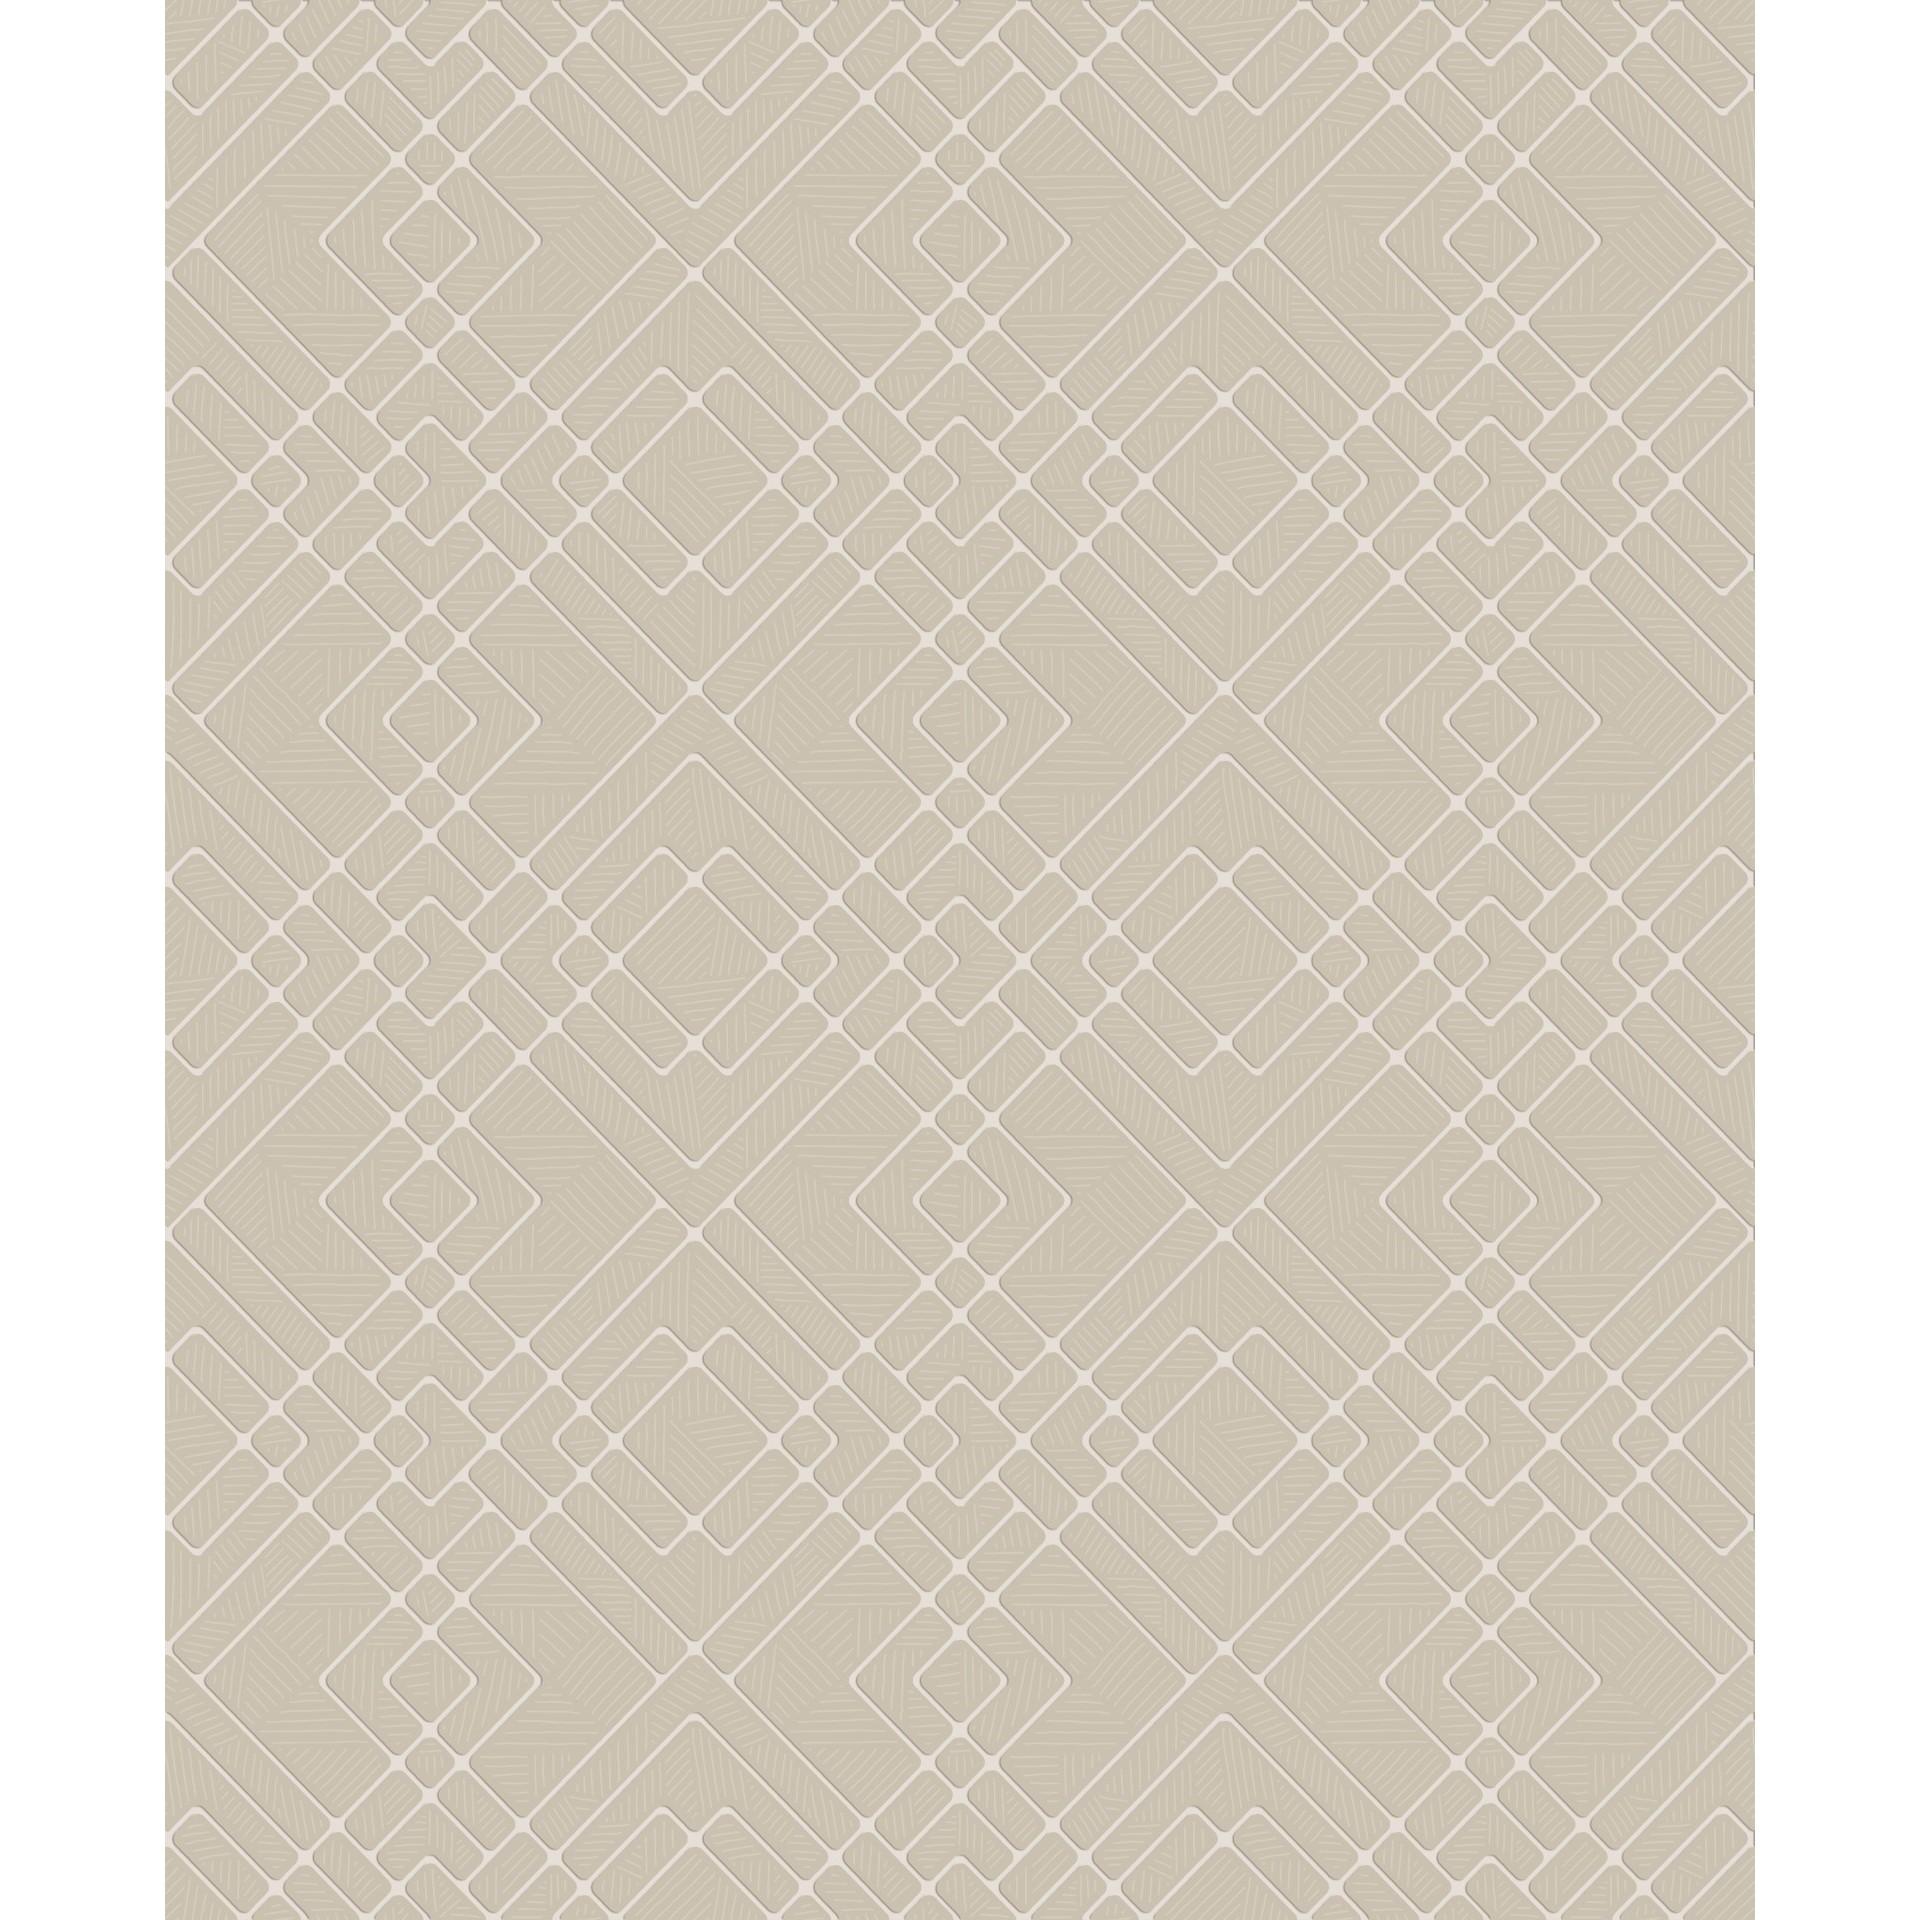 Papel de Parede 53cm x 10m Nonwoven Texturizado 1073 - Jolie